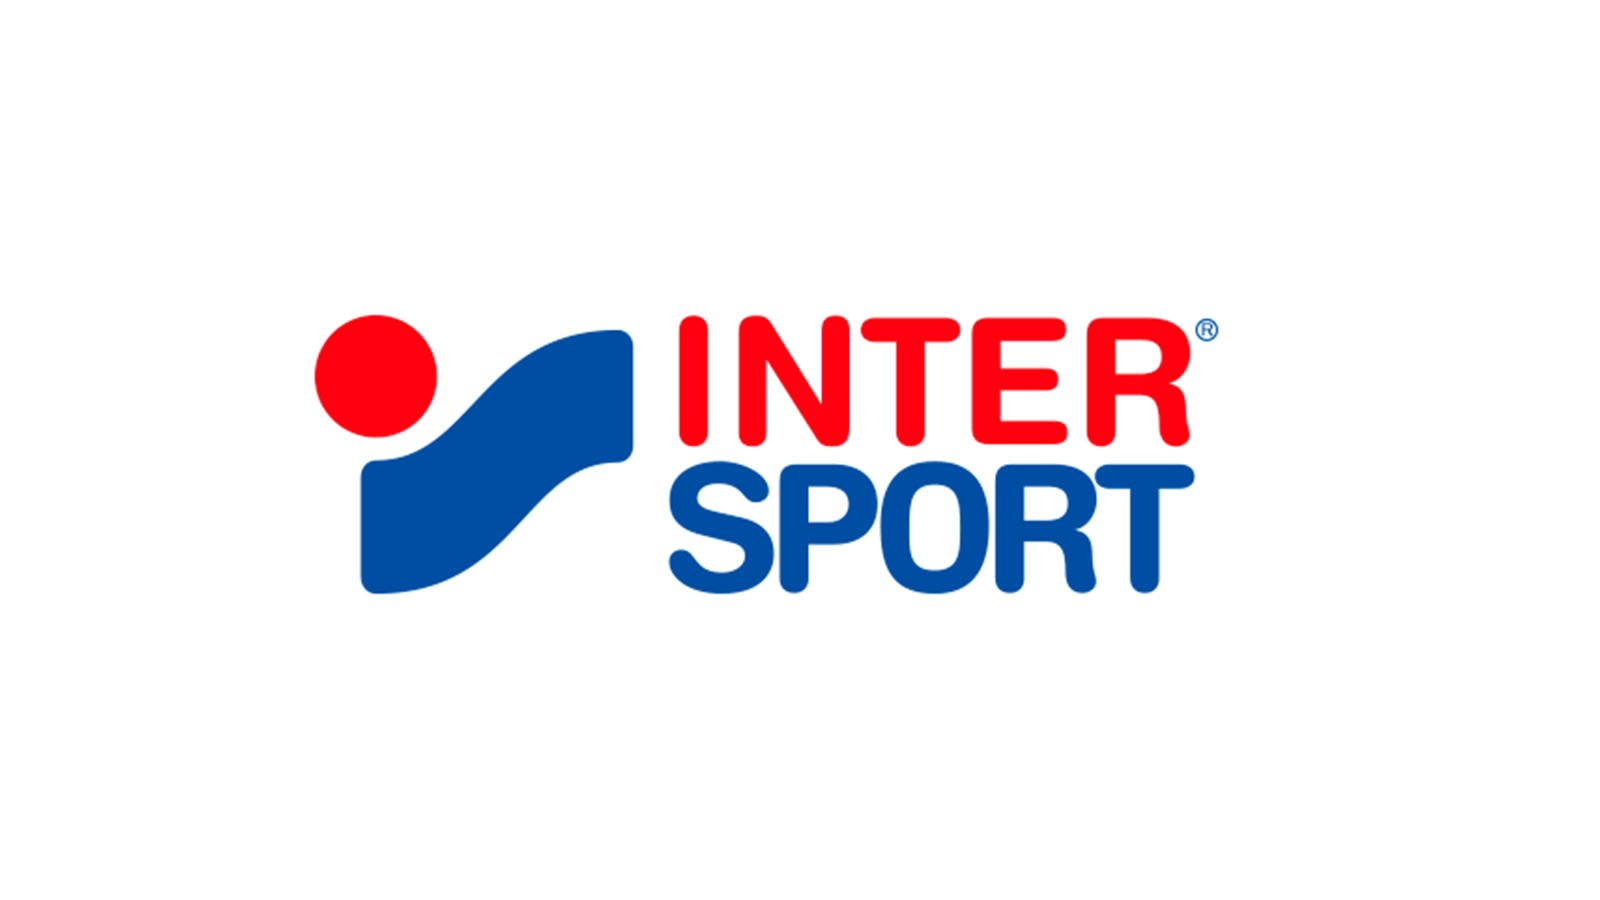 Interspot